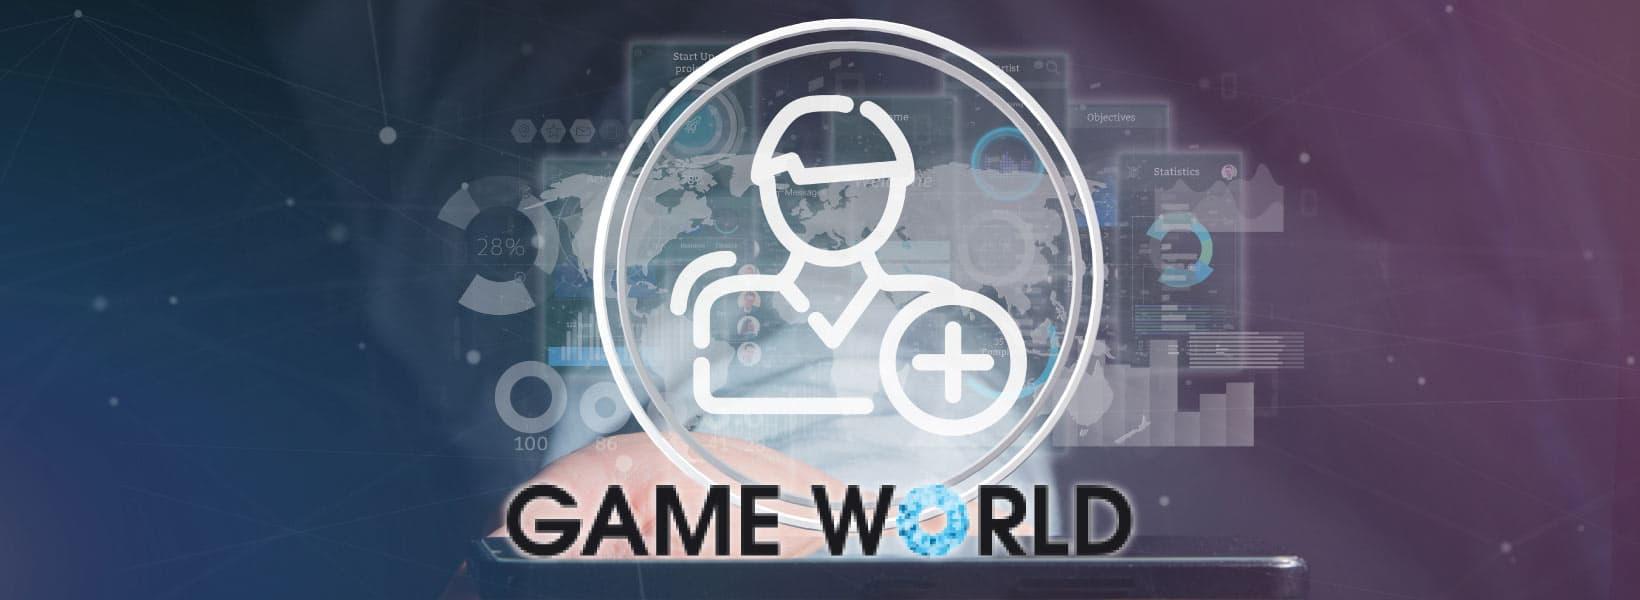 înregistrare game world